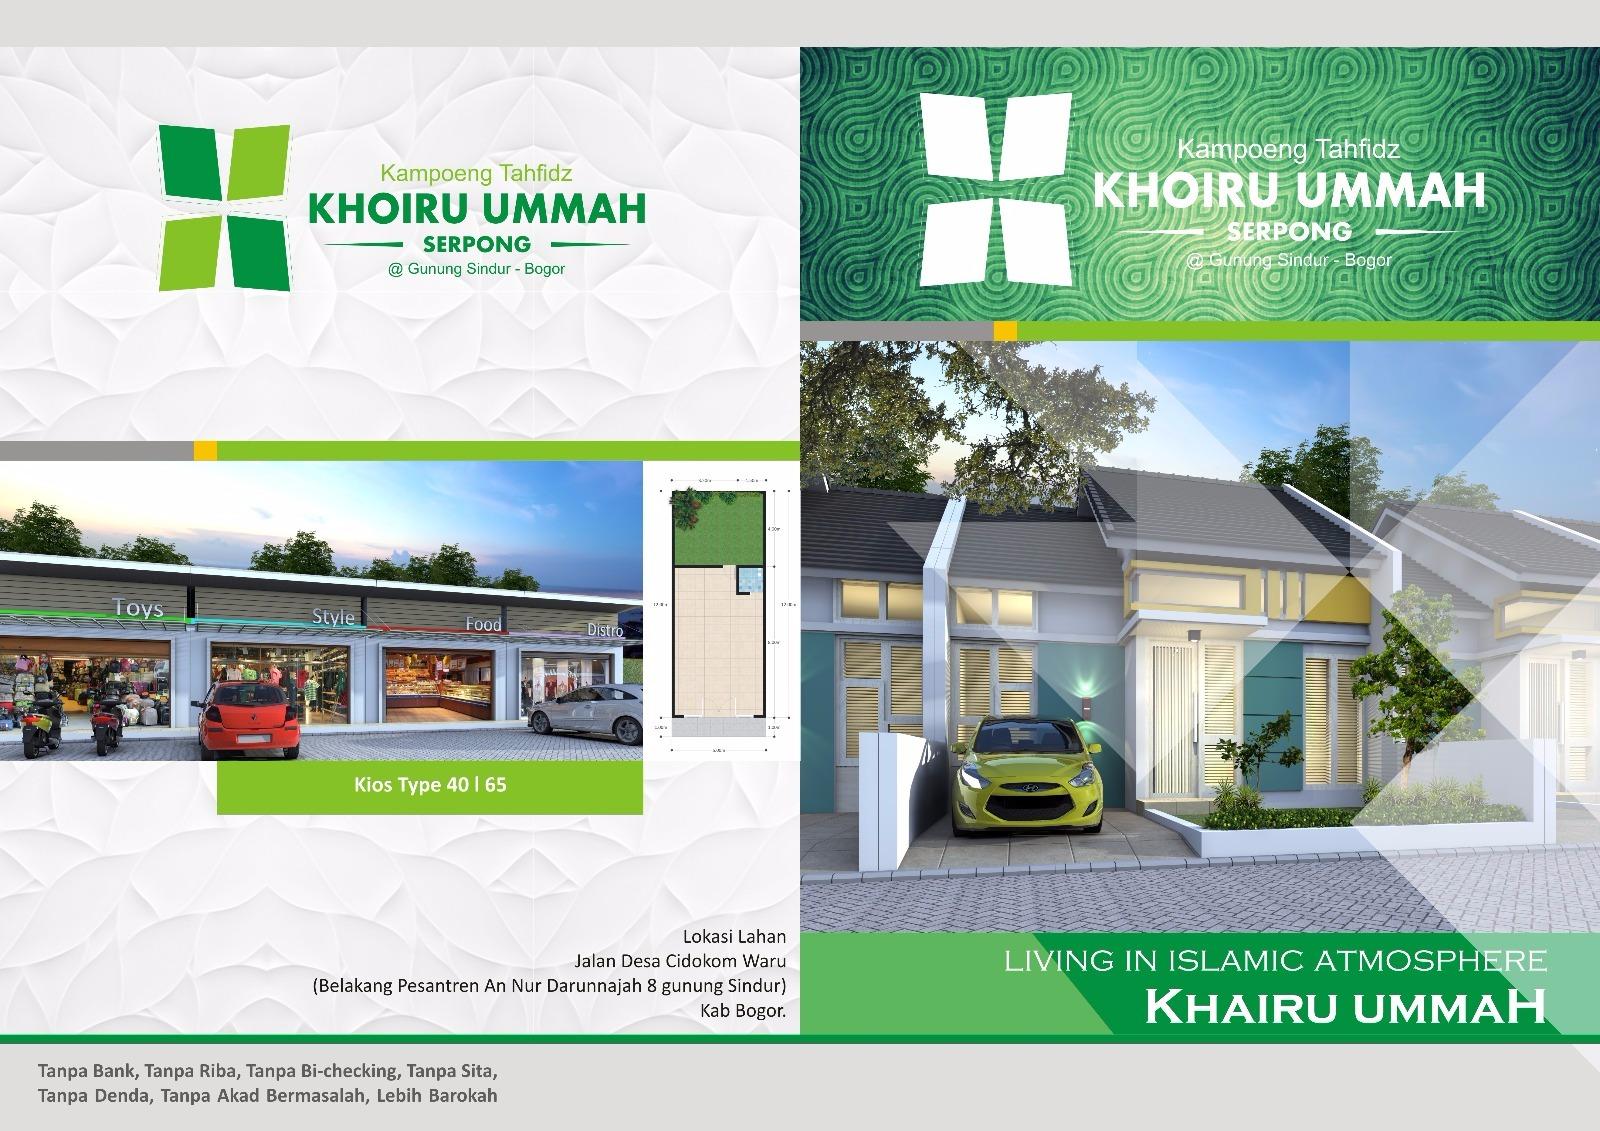 Perumahan Islami Kampoeng Tahfidz Khairu Ummah